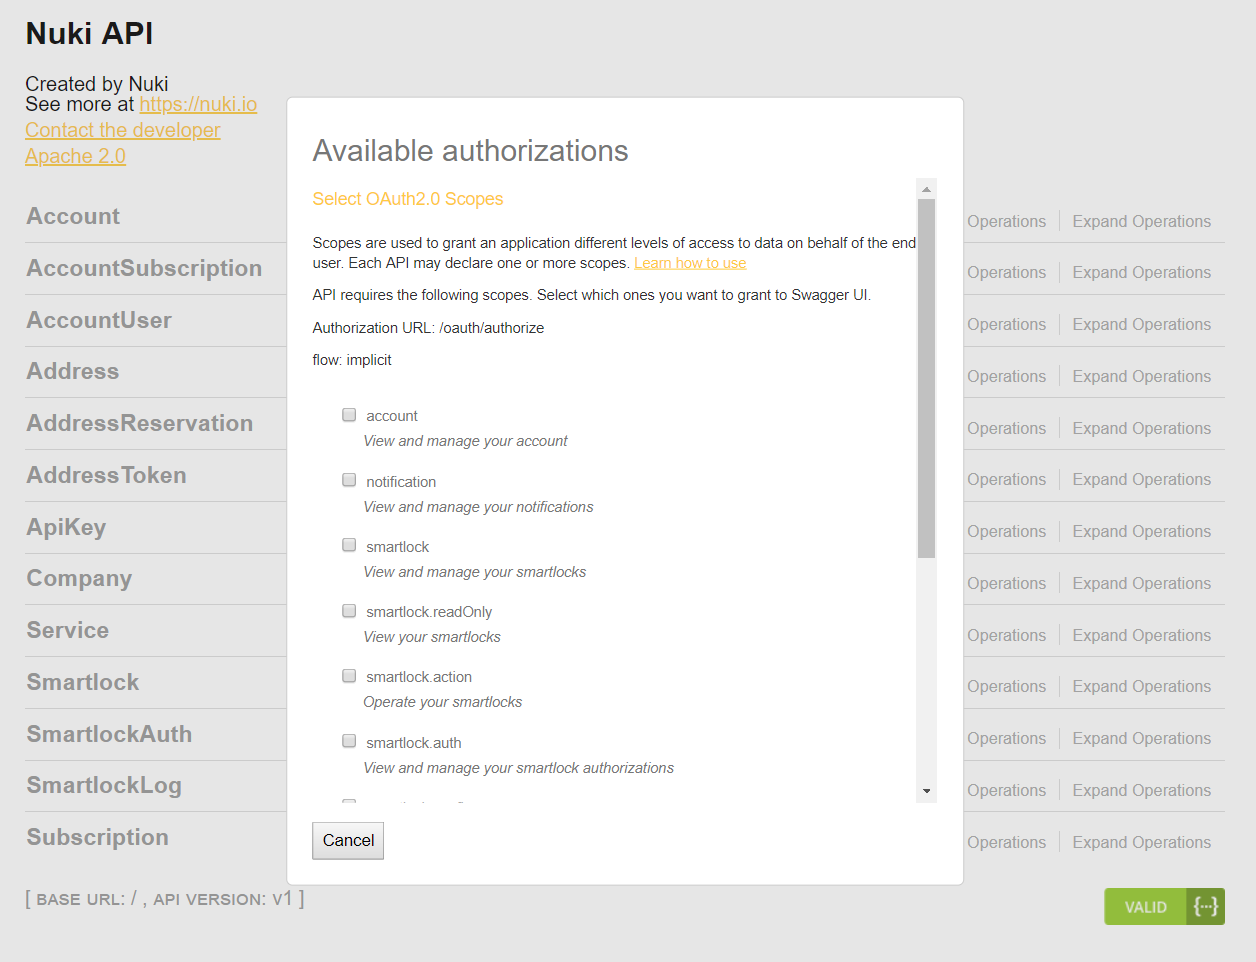 Swagger Interface - Web API - Nuki Developers